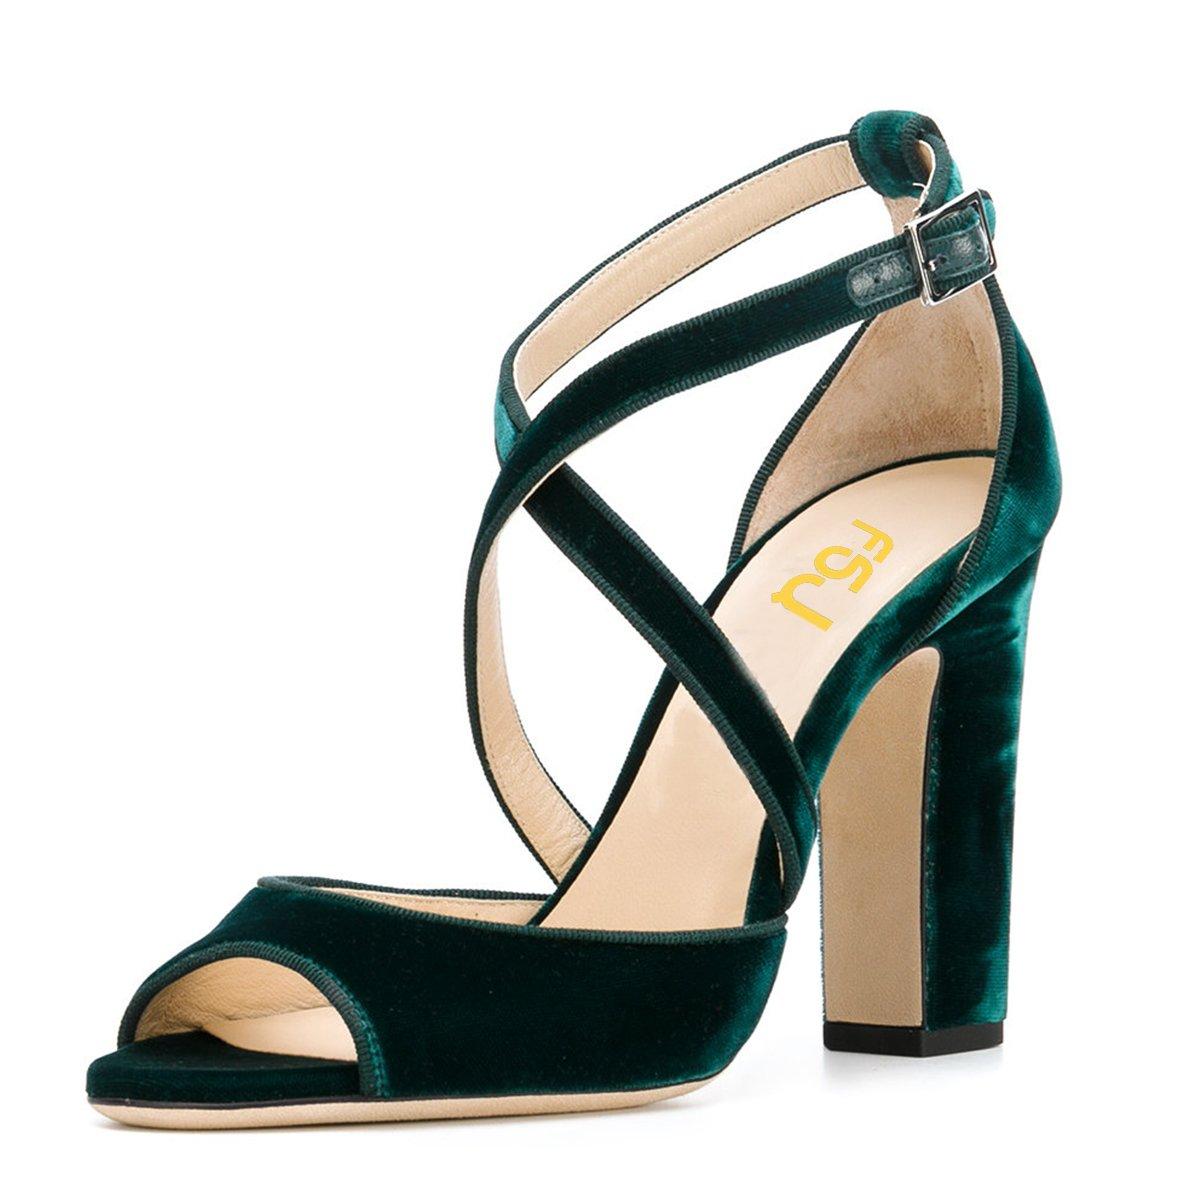 FSJ Women Elegant Peep Toe Sandals Chunky High Heel Pumps Cross Strap Velvet Dress Shoes Size 9.5 Emerald